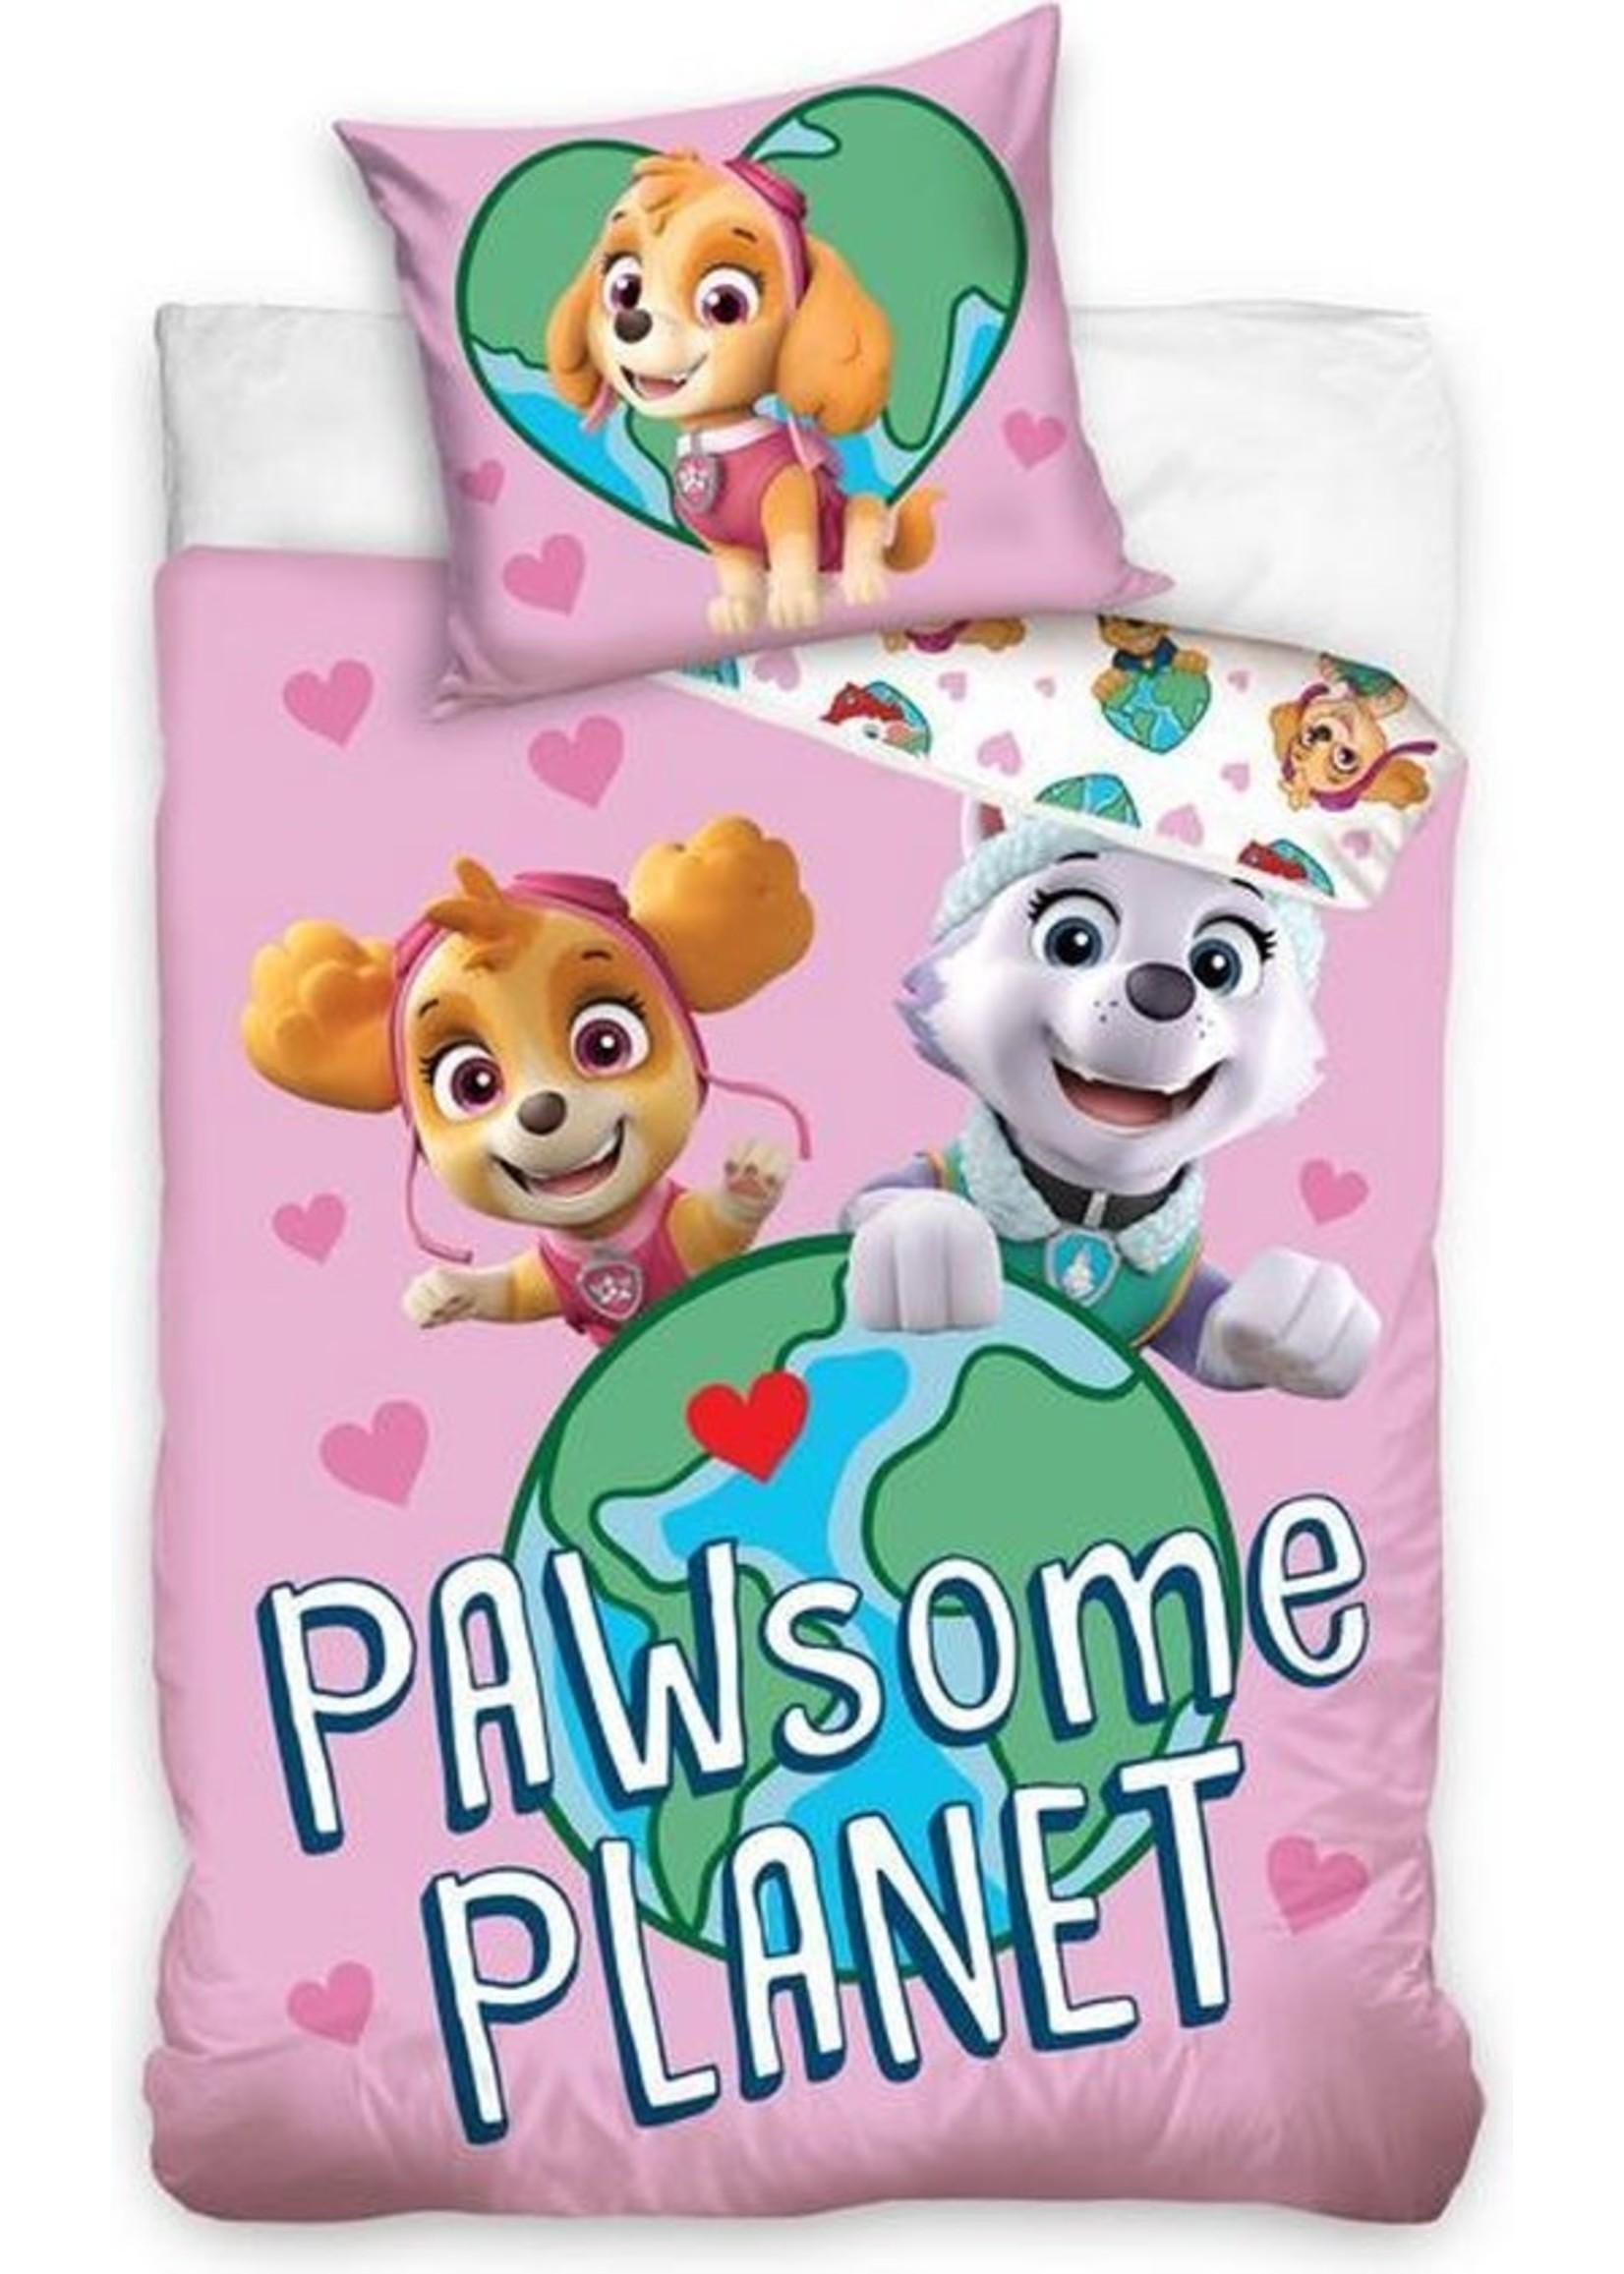 PAW Patrol Dekbedovertrek Pawsome Planet - Eenpersoons - 140x200 cm